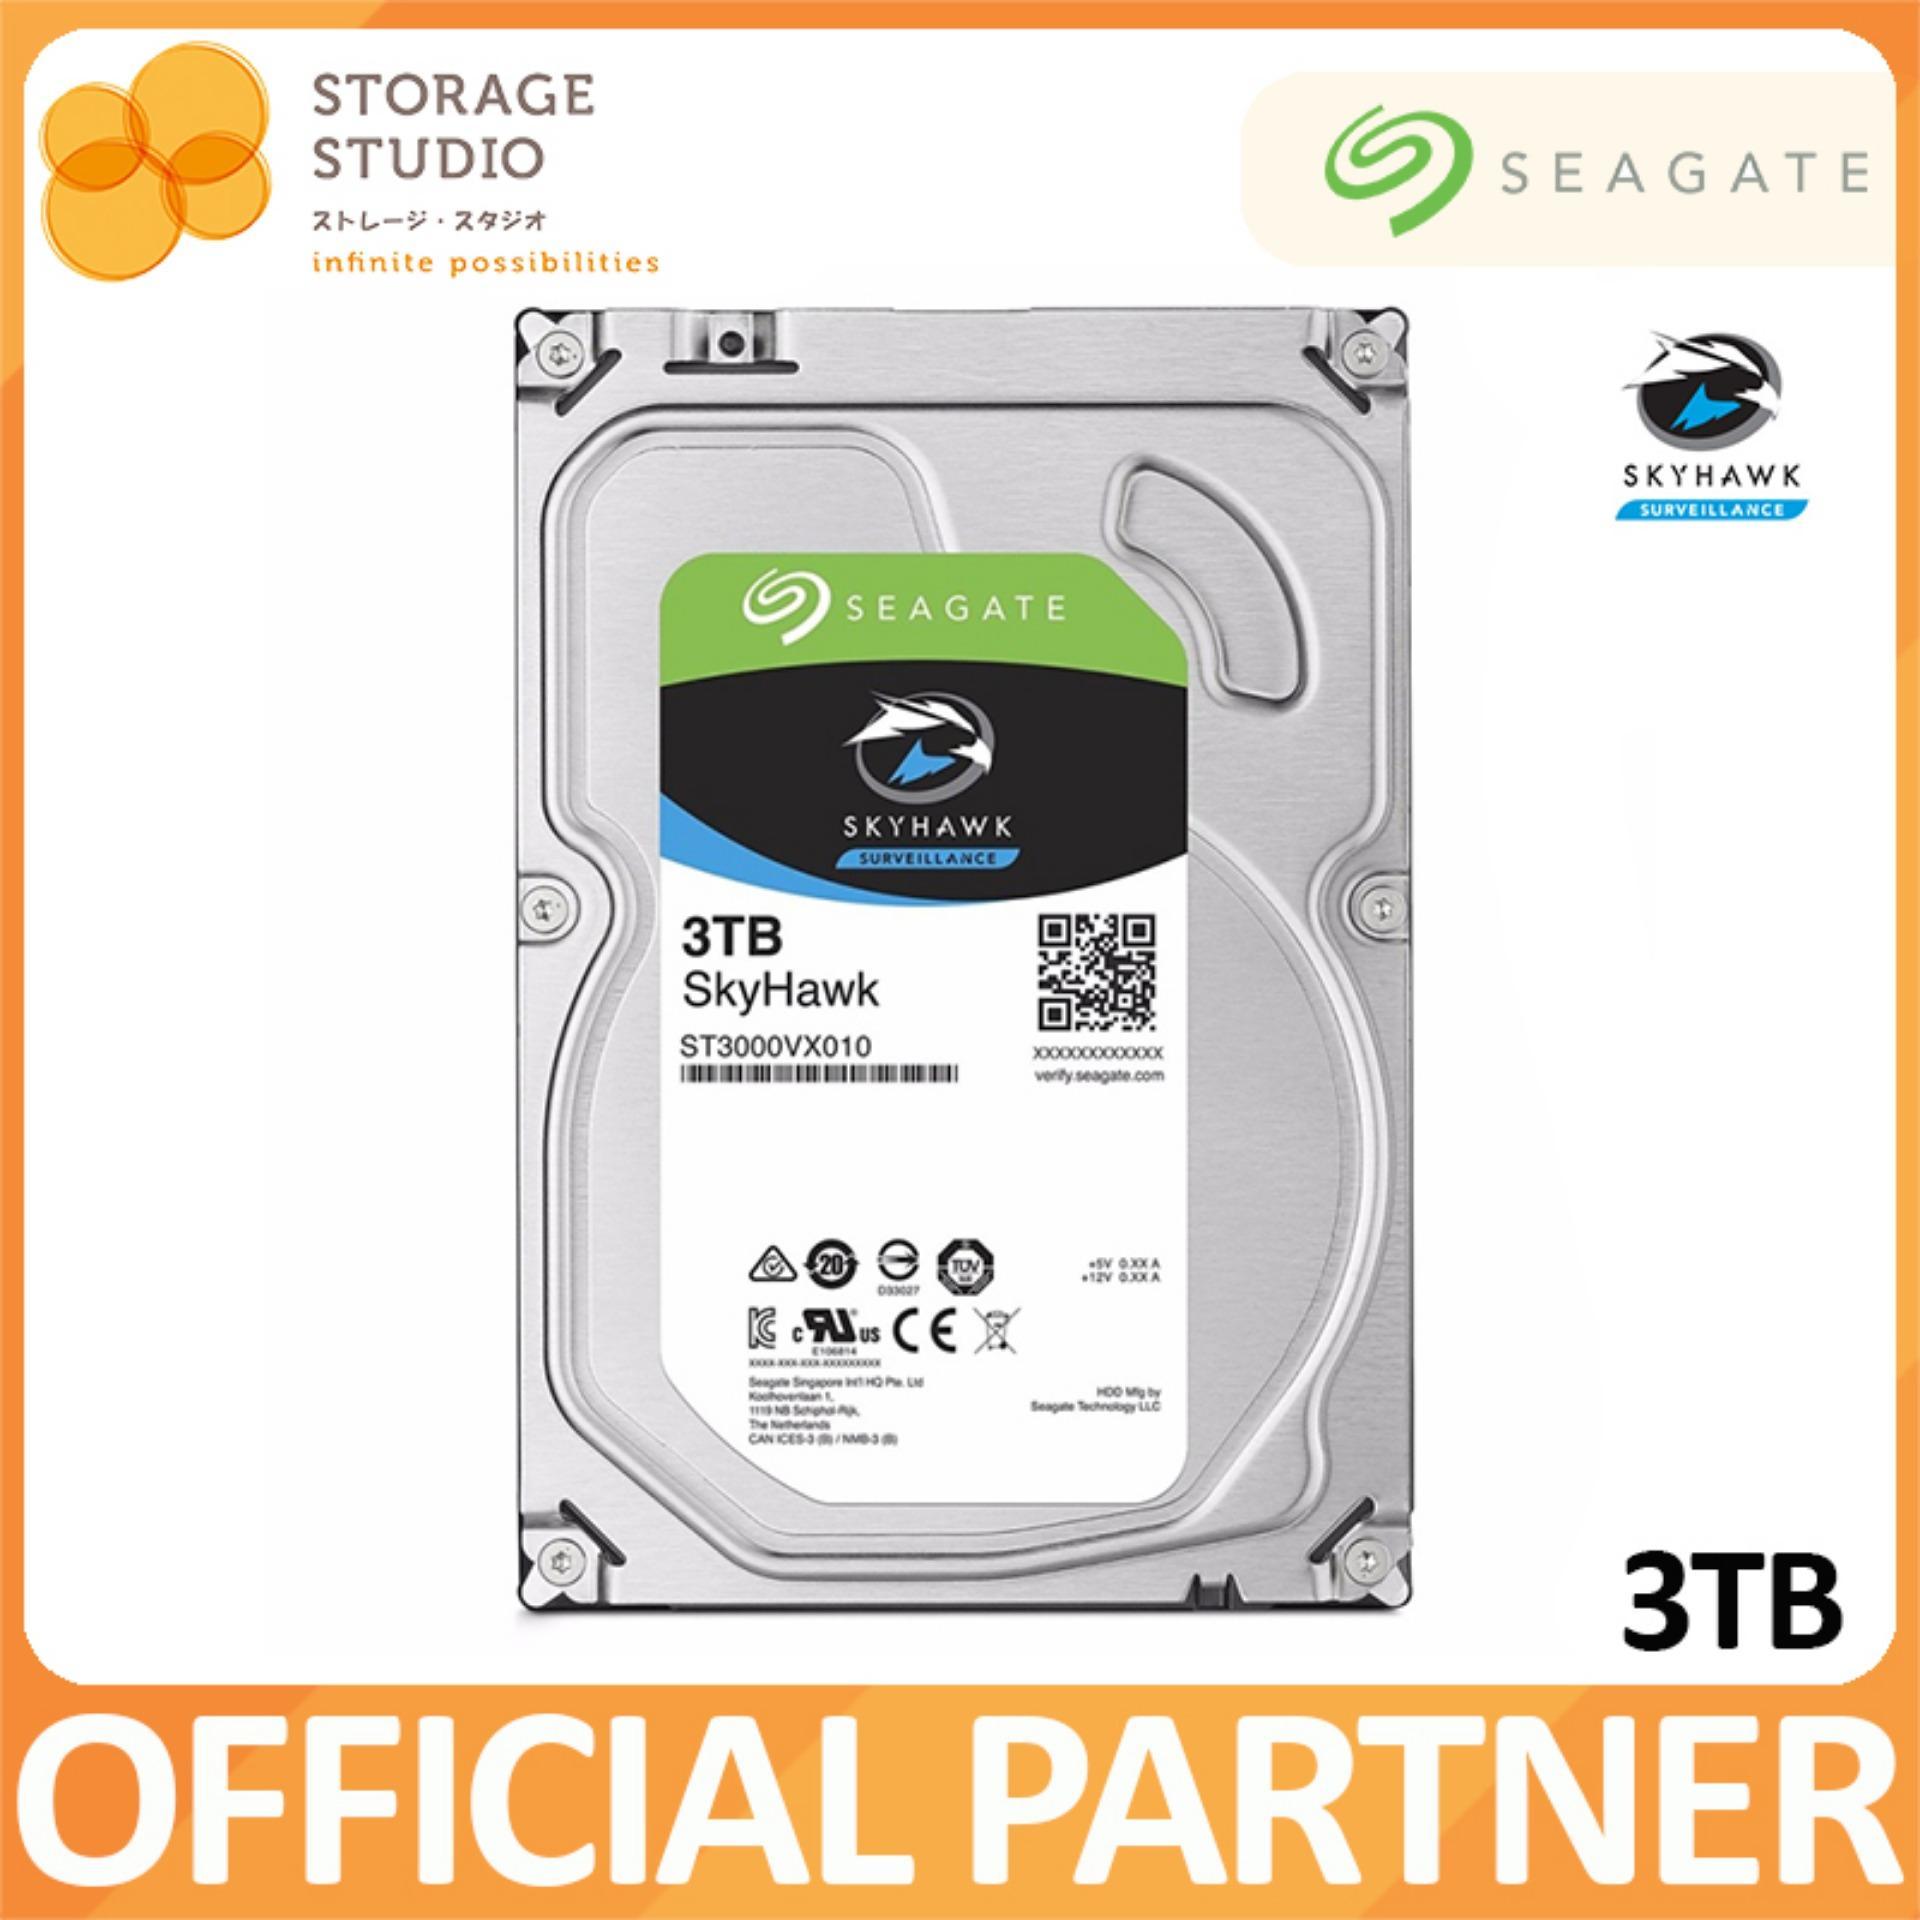 Seagate 3tb Skyhawk Surveillance Hard Disk Singapore Hardisk Skyhawlk 1tb